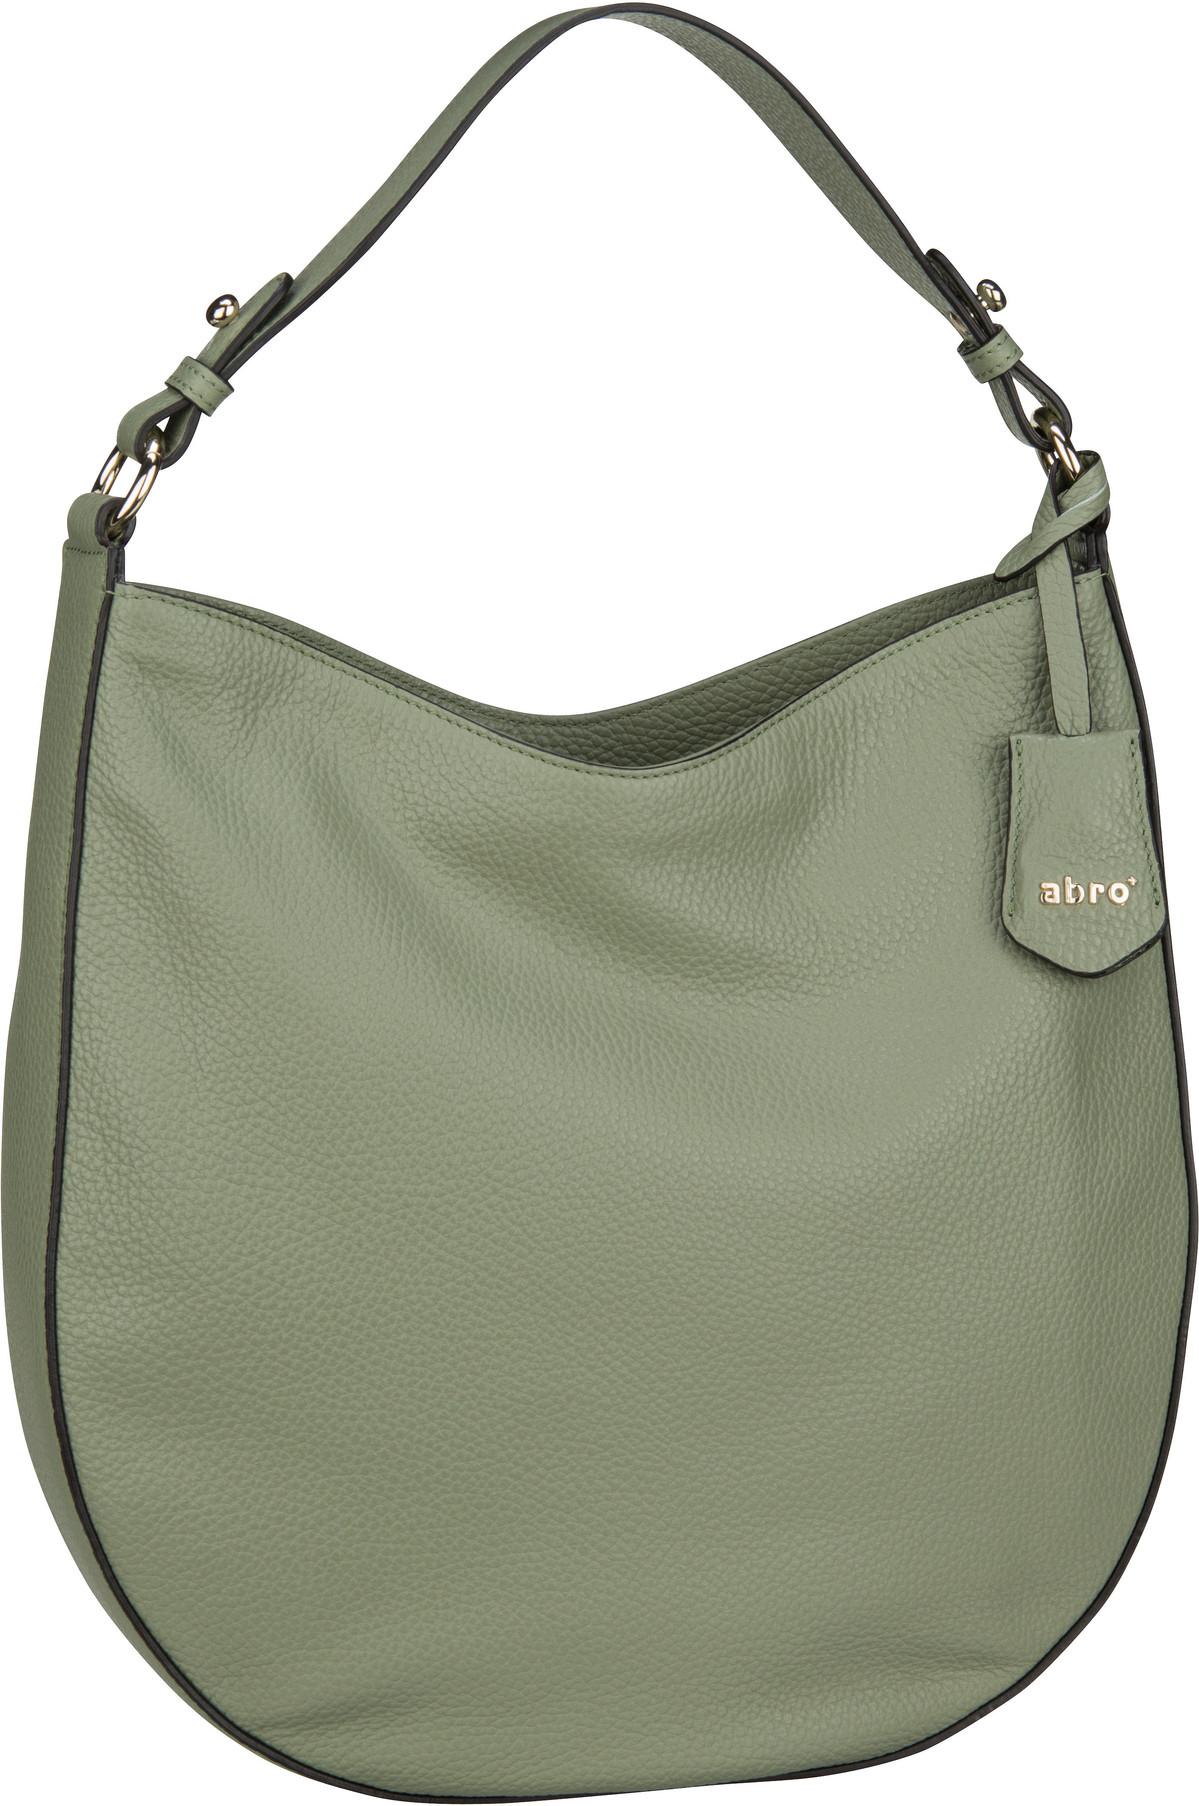 Handtasche Calf Adria 28486 Oliv